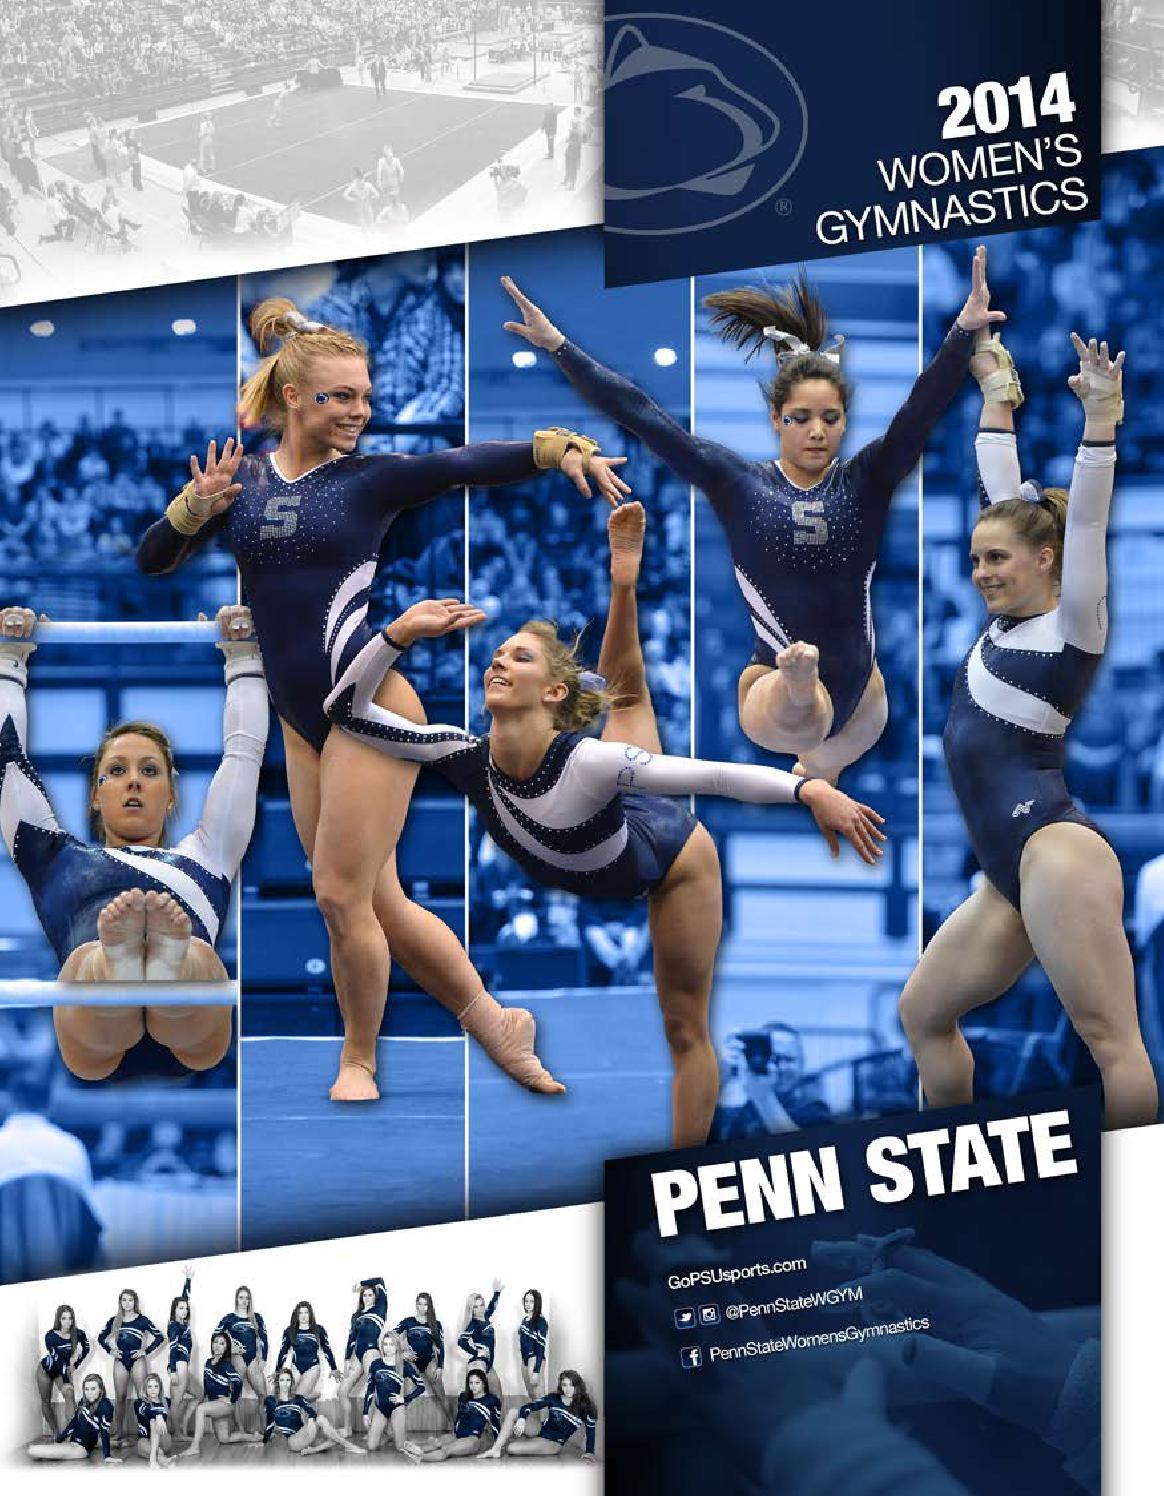 sc state gymnastics meet 2013